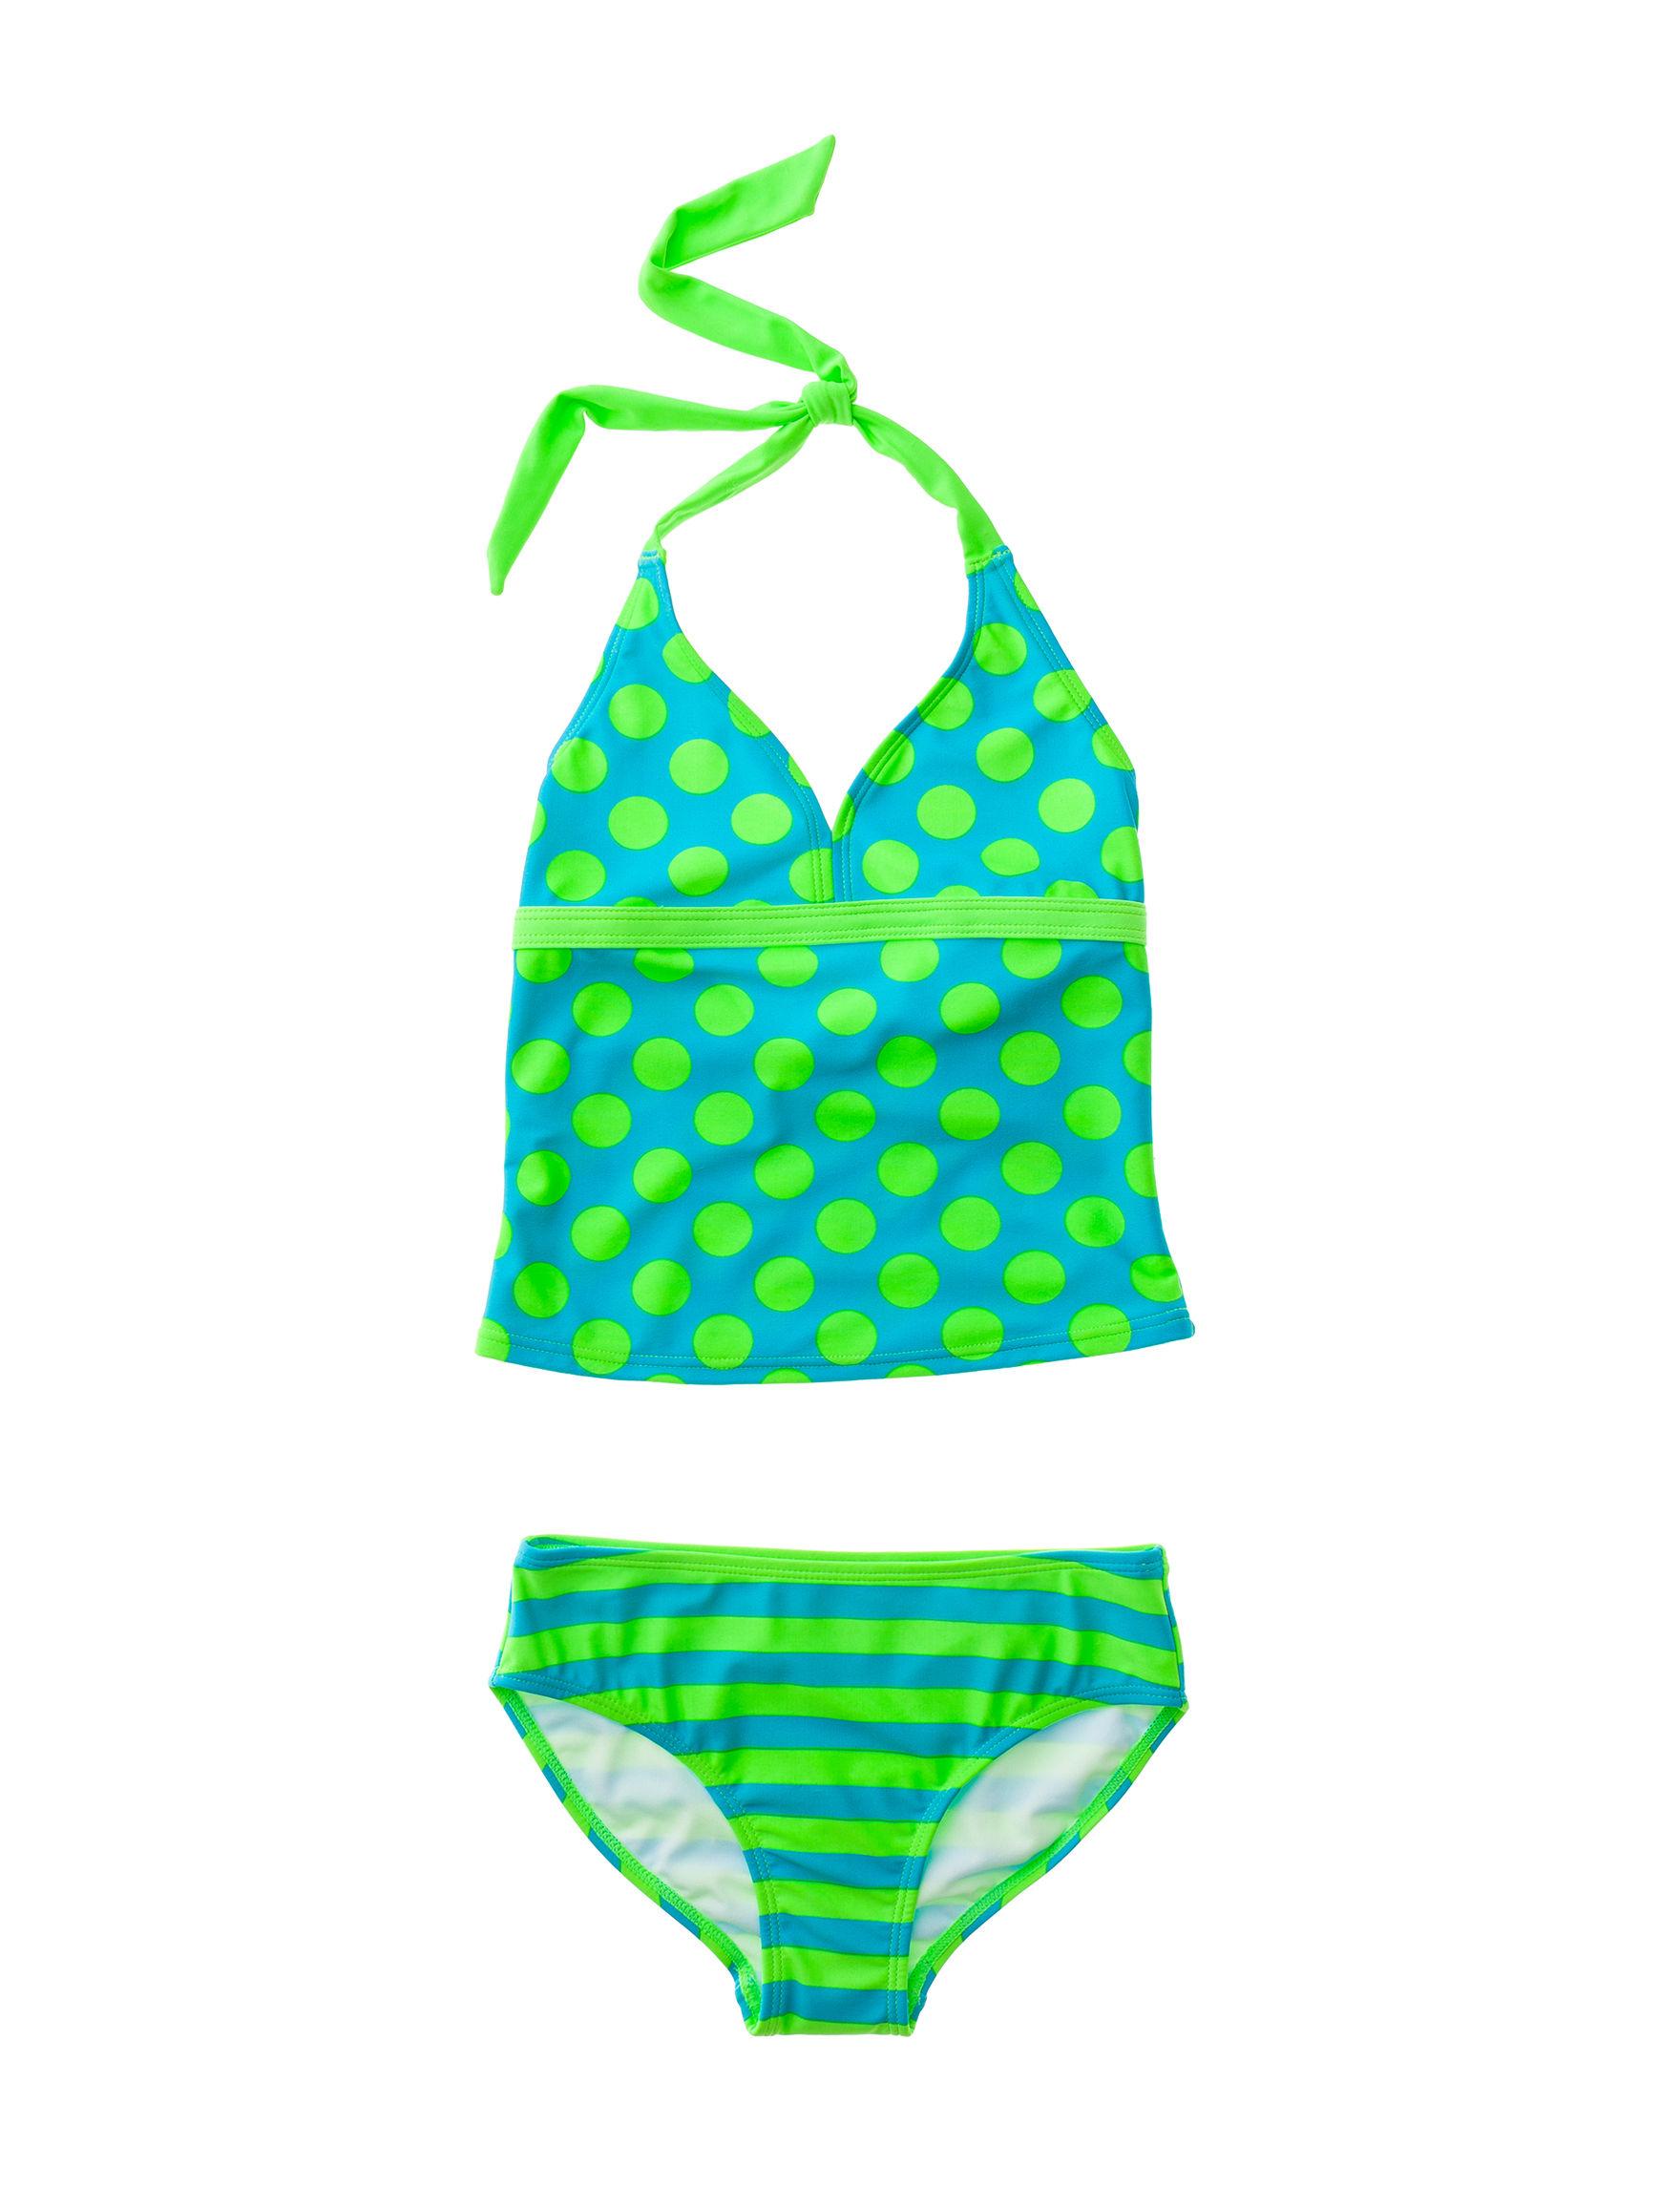 St Tropez Turquoise Swimsuit Sets